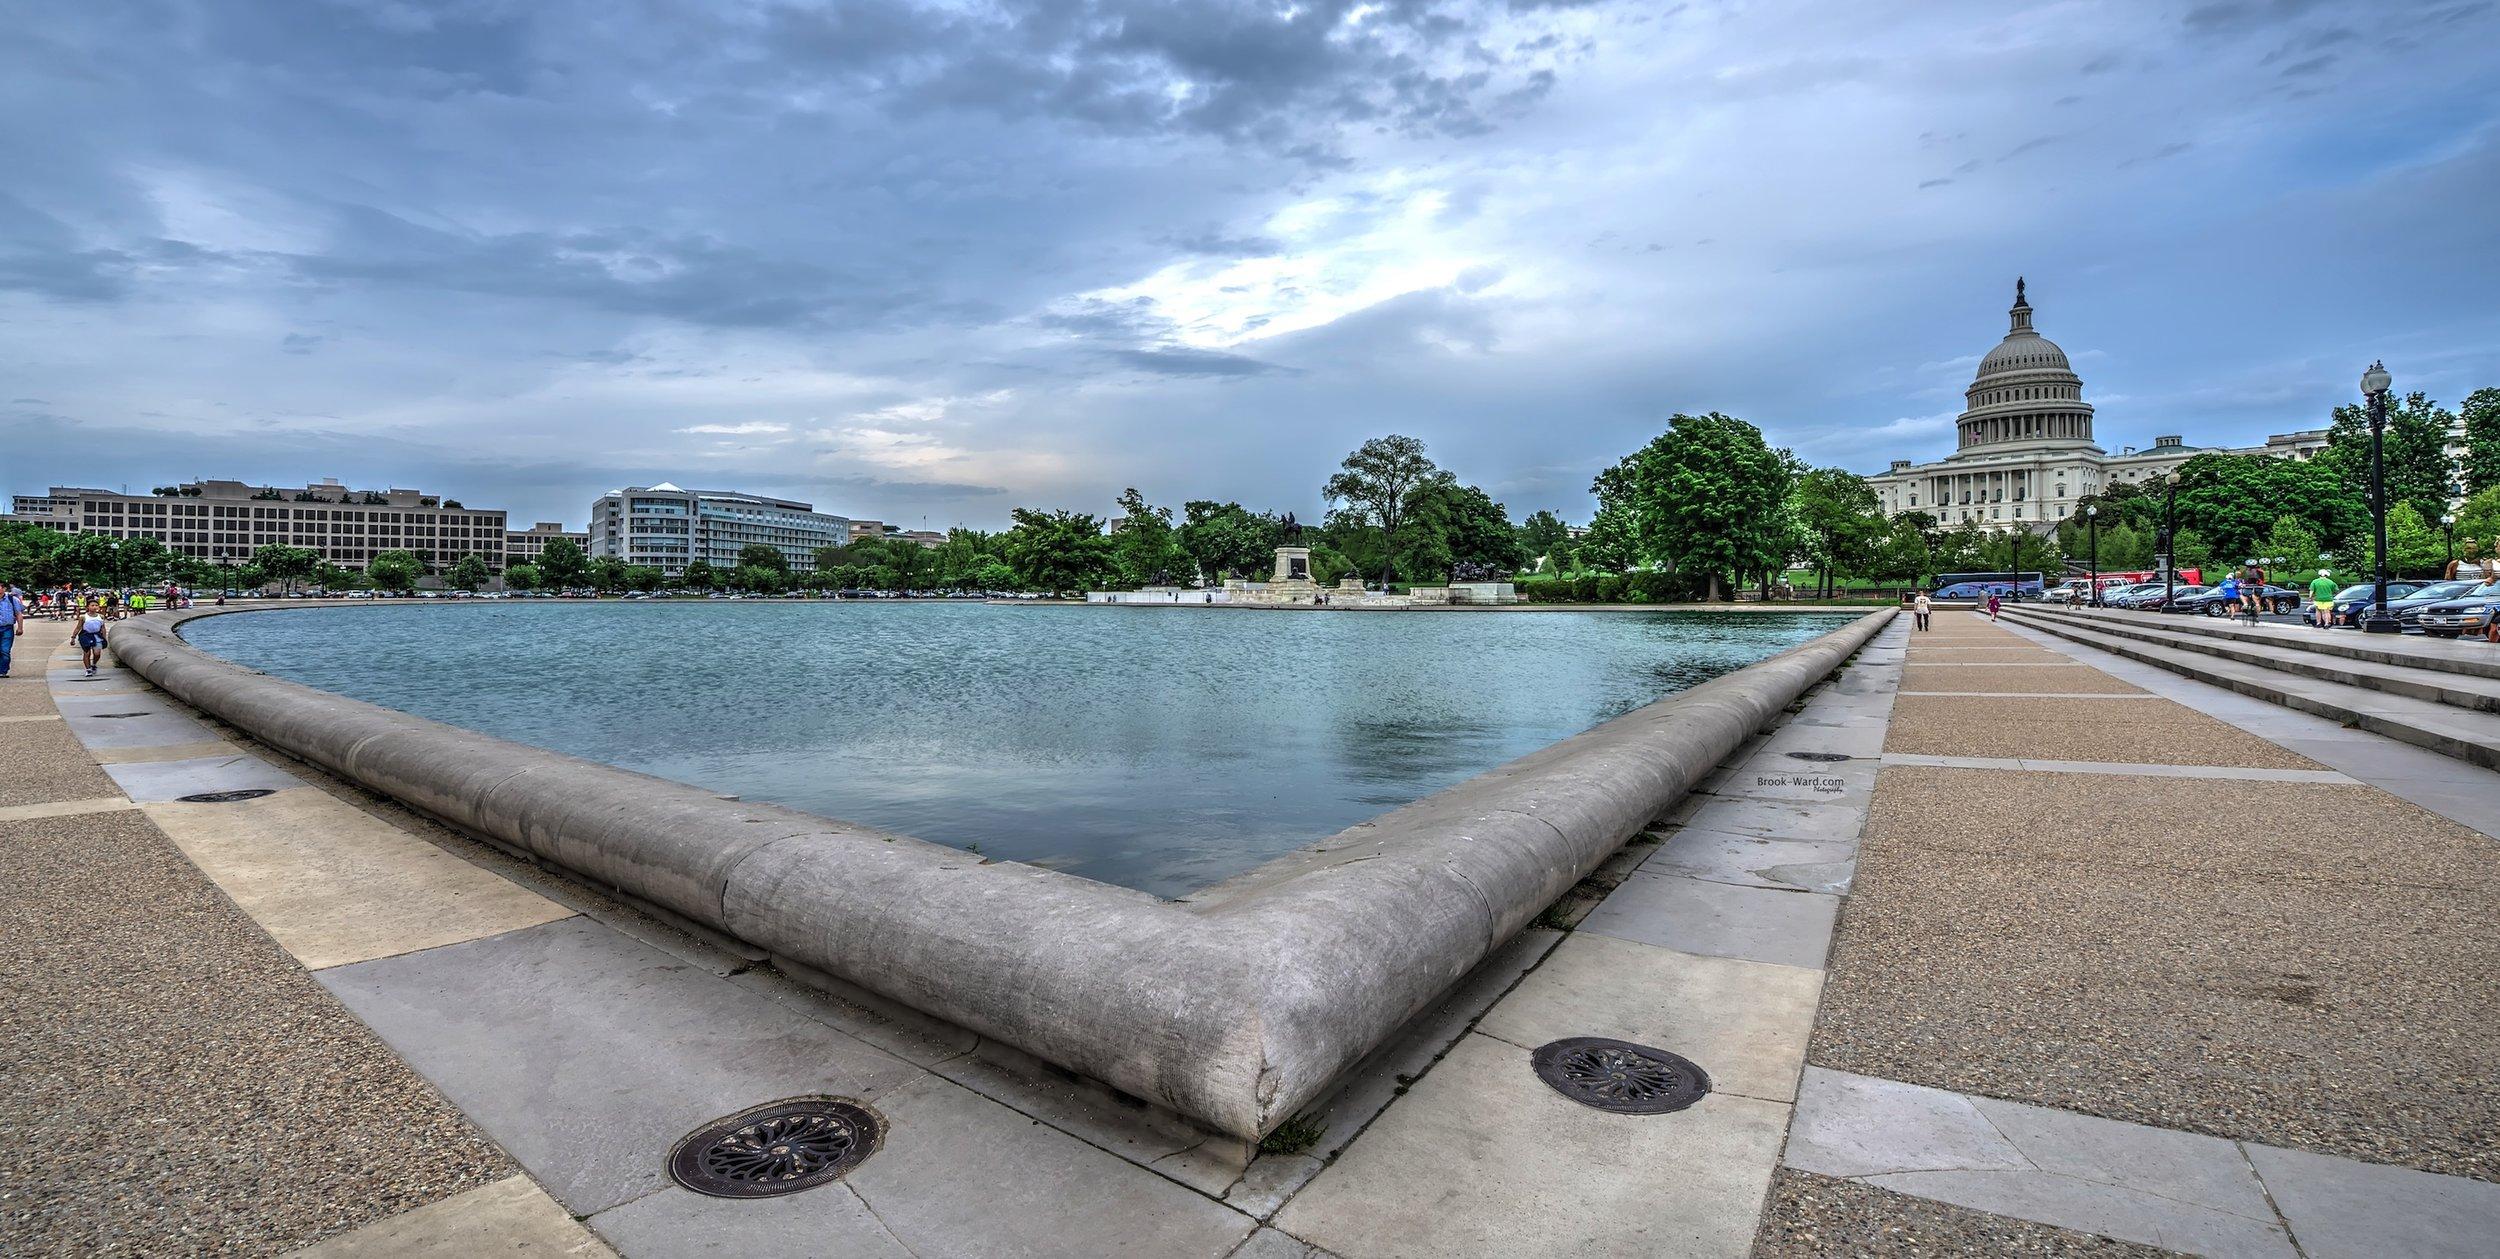 Capital Reflecting Pool